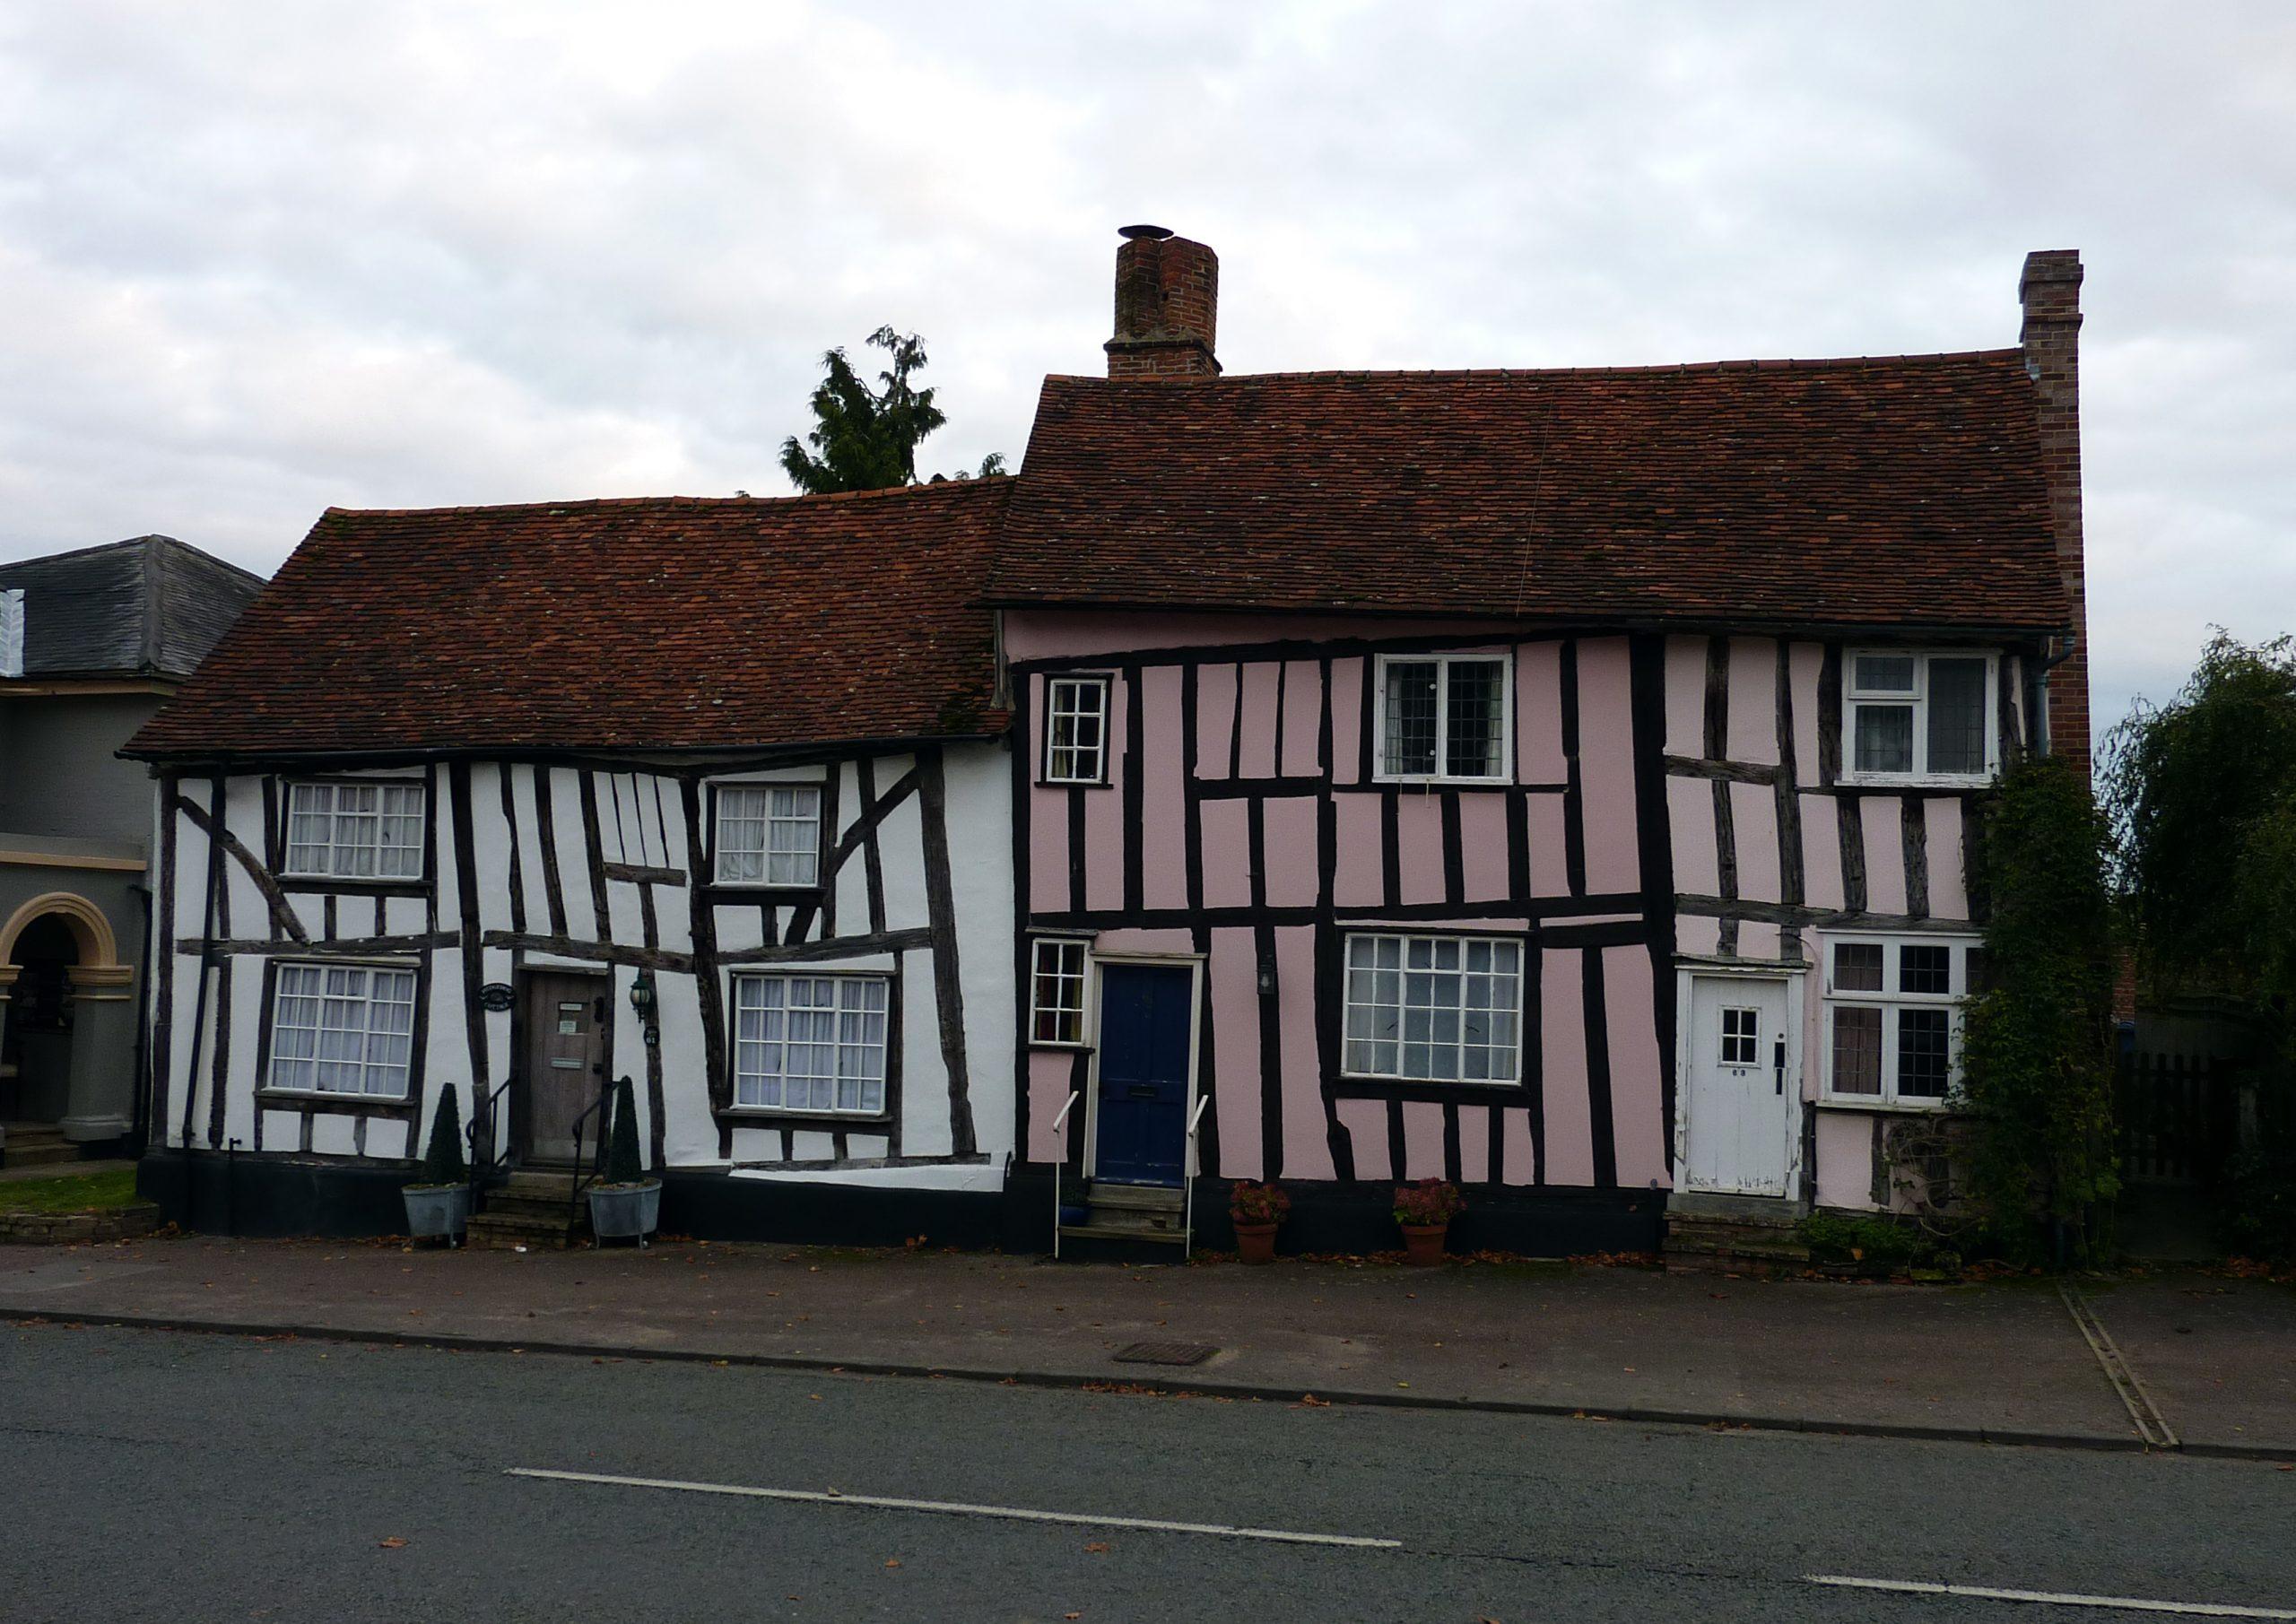 Laura S London A Visit To Lavenham Suffolk Finest